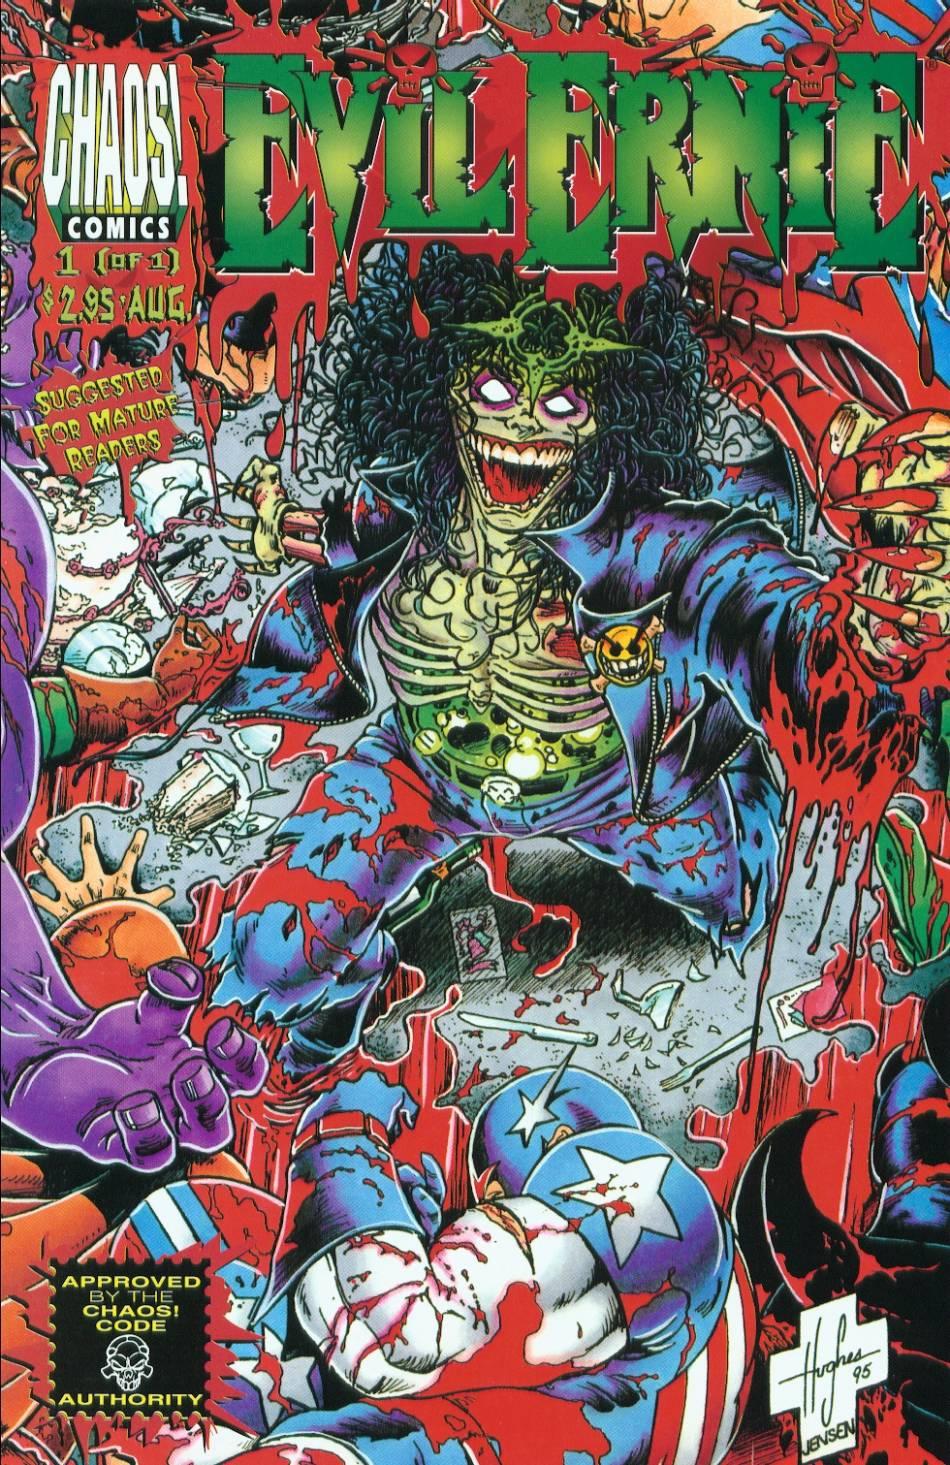 Read online Evil Ernie vs. the Superheroes comic -  Issue #1 - 1